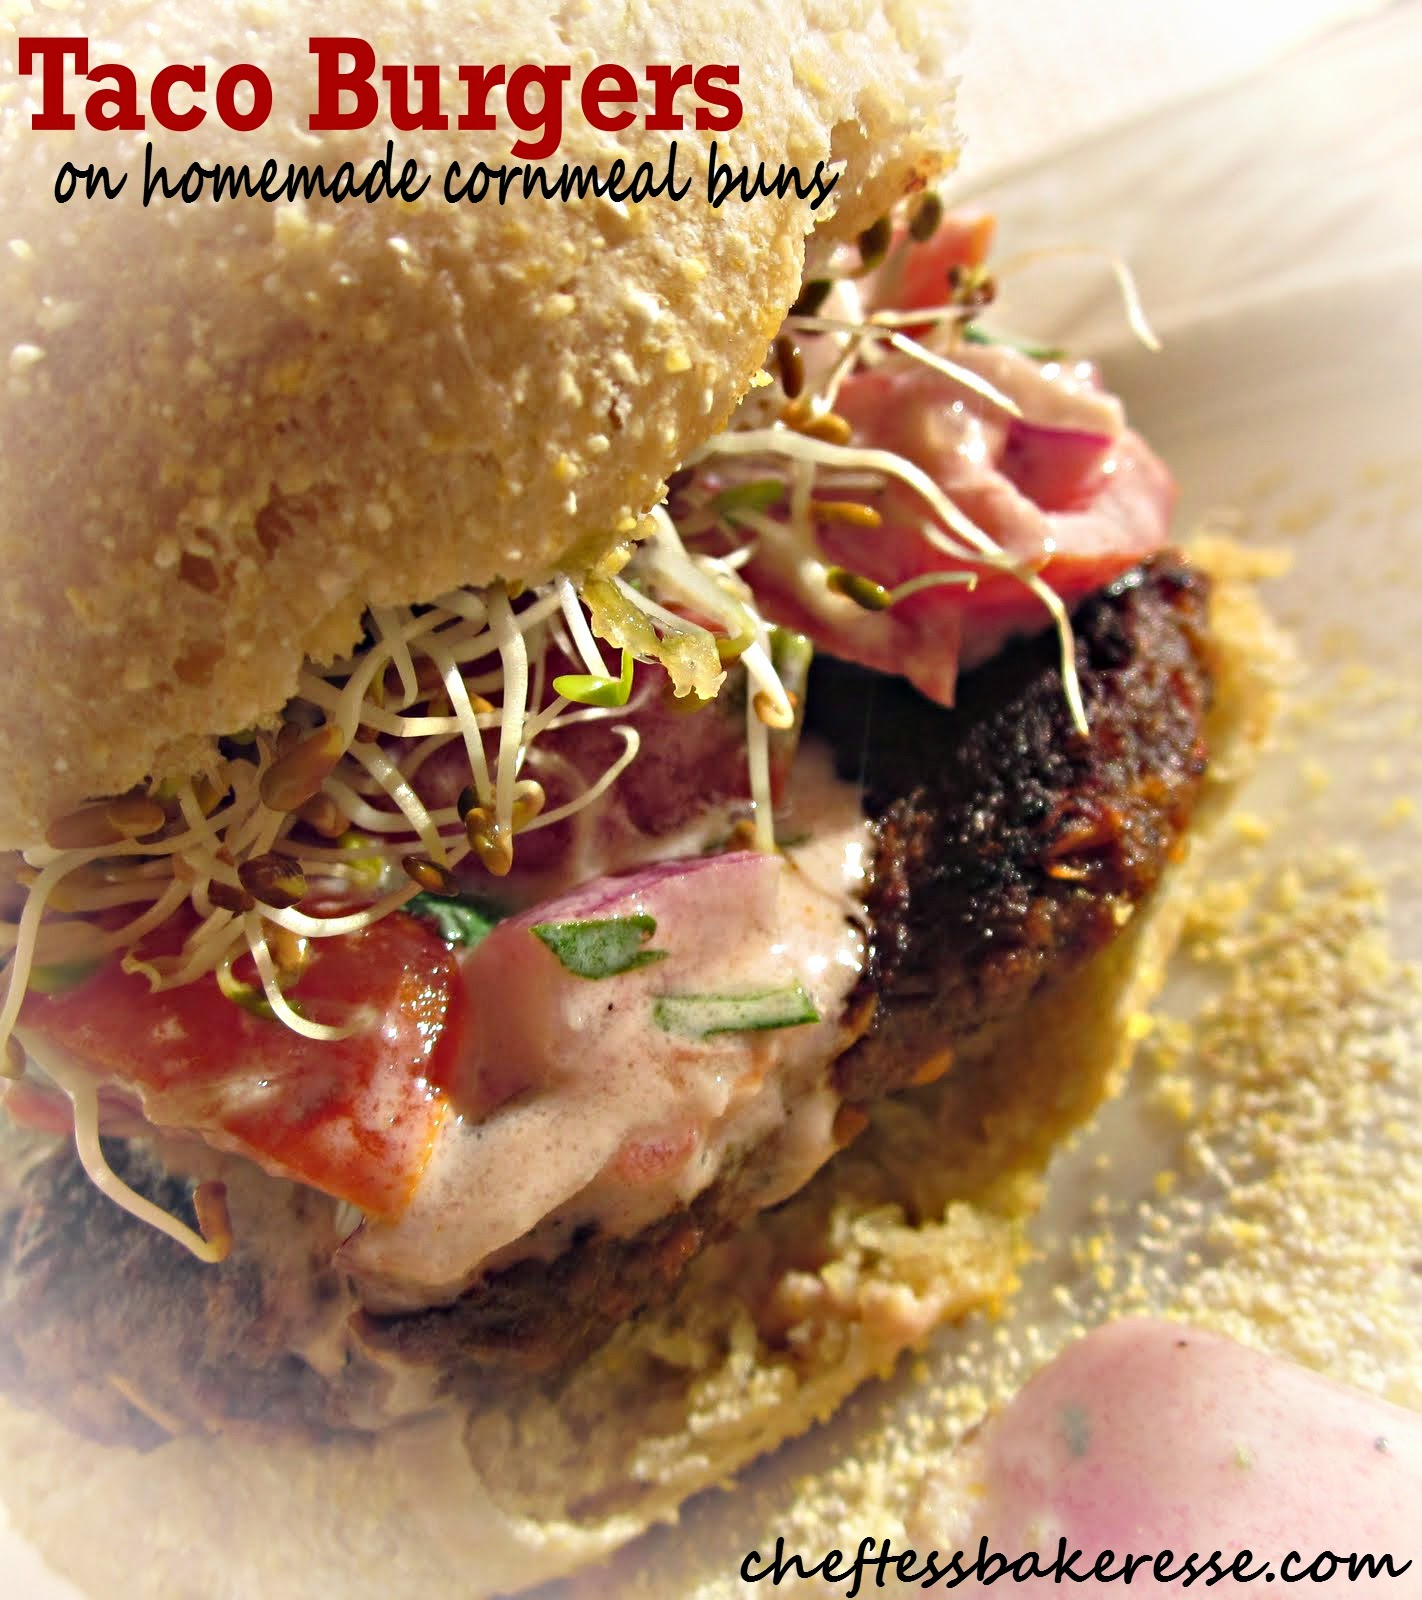 Taco Burgers on Fluffy Cornmeal green chile buns